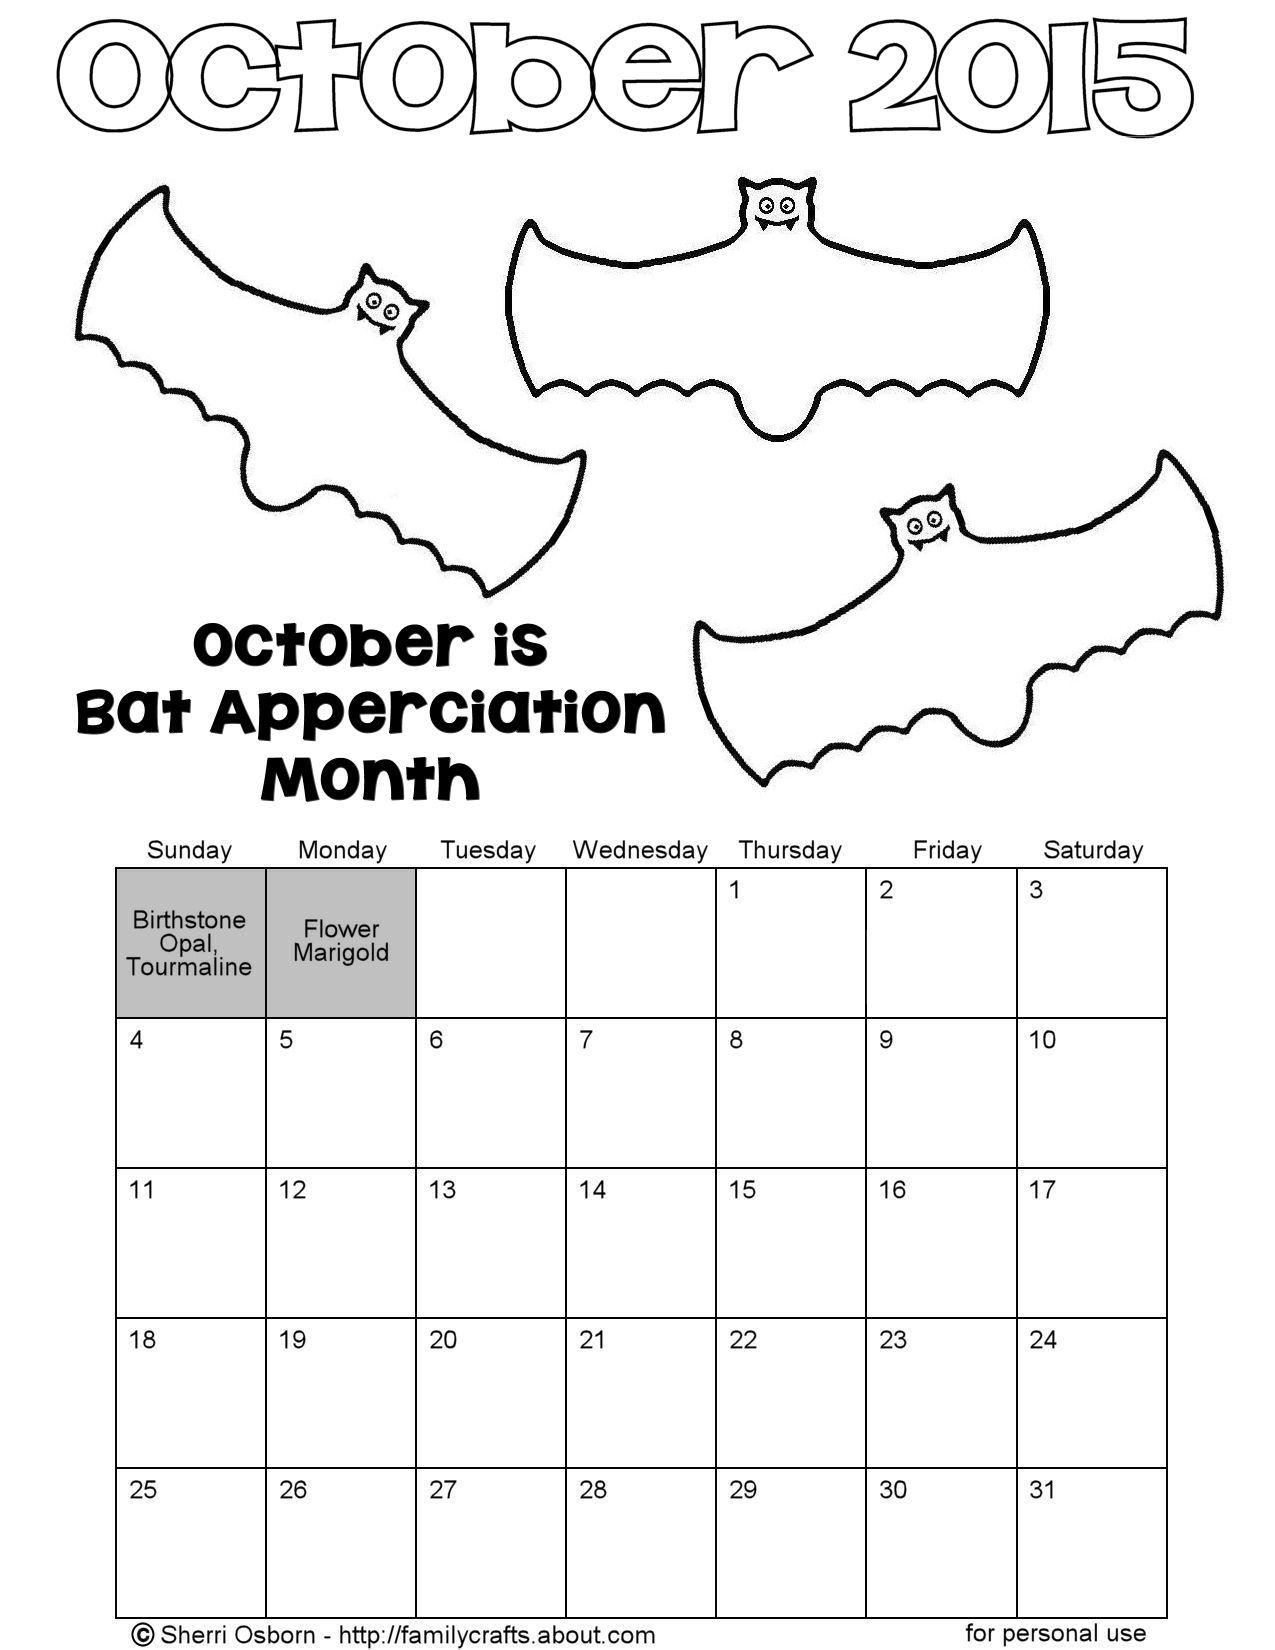 2012 october coloring calendar small.jpg